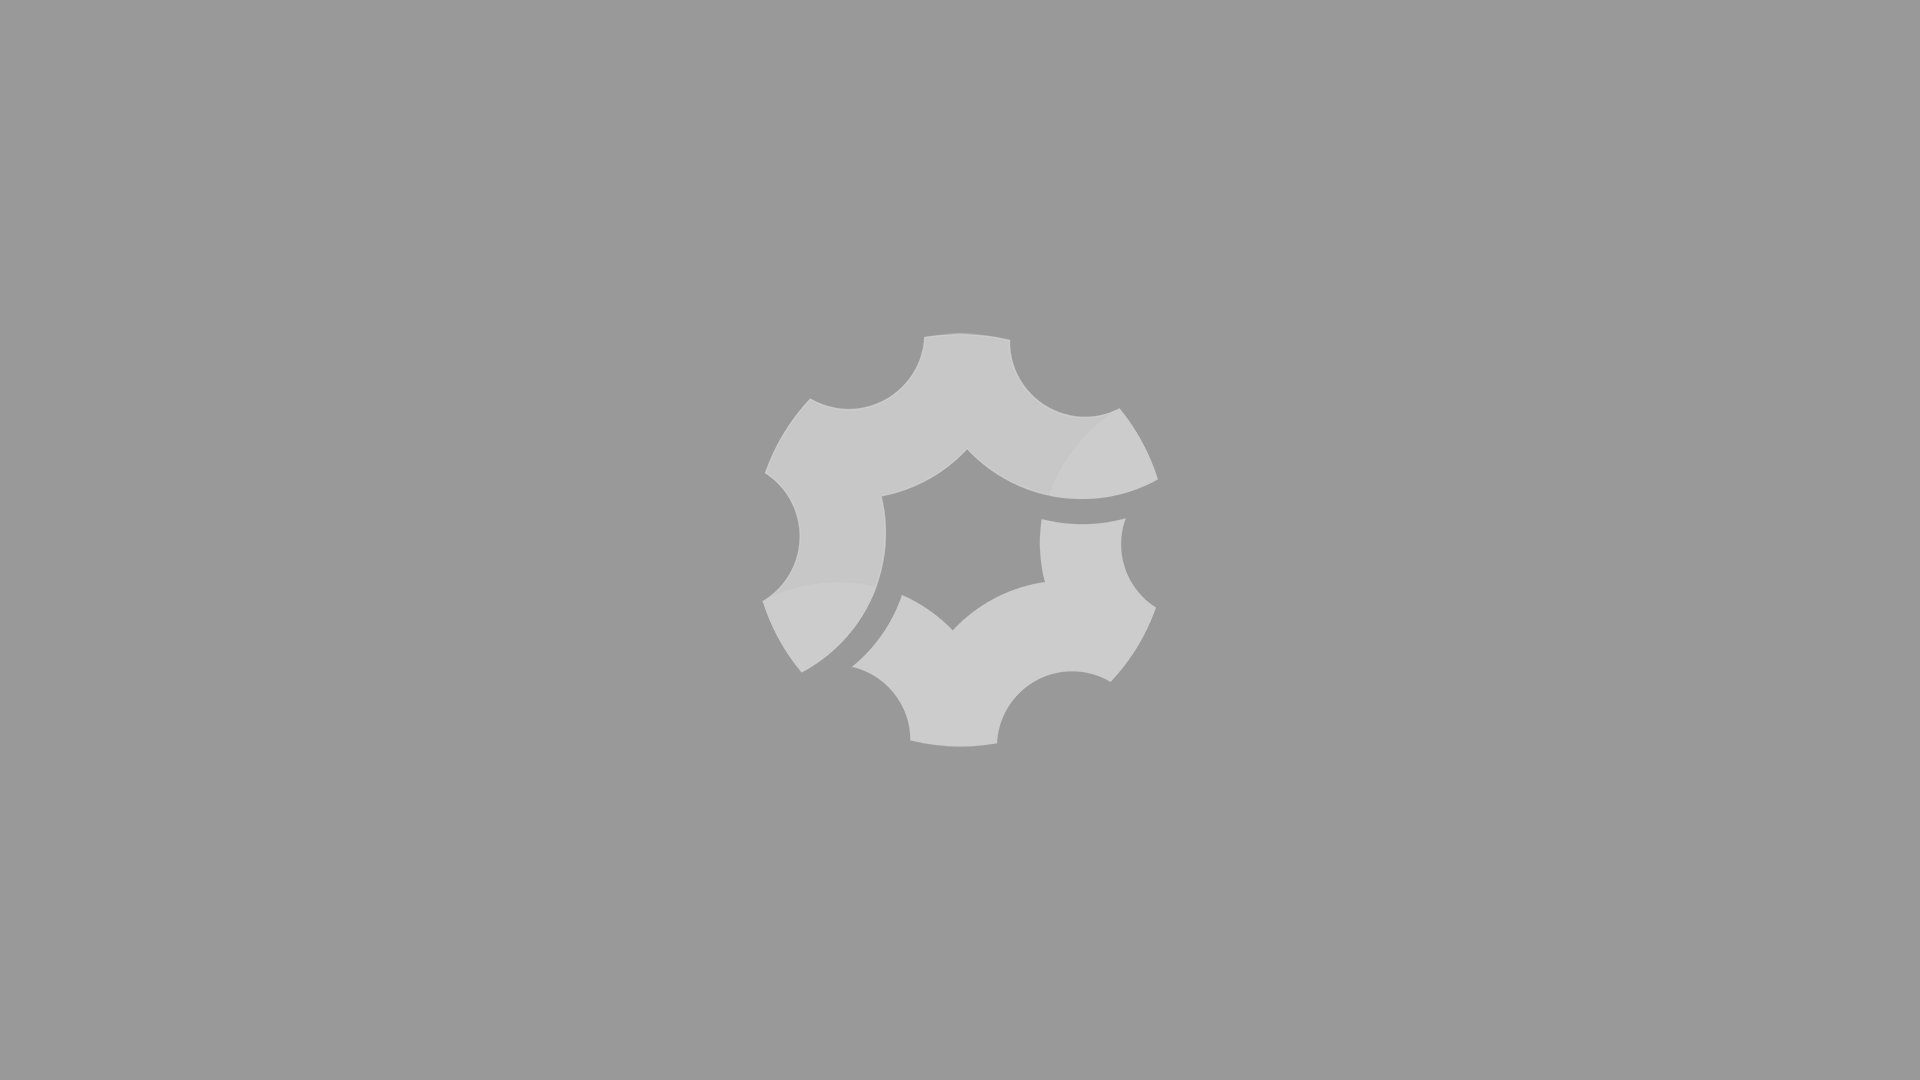 origins-triangleboard.2.png